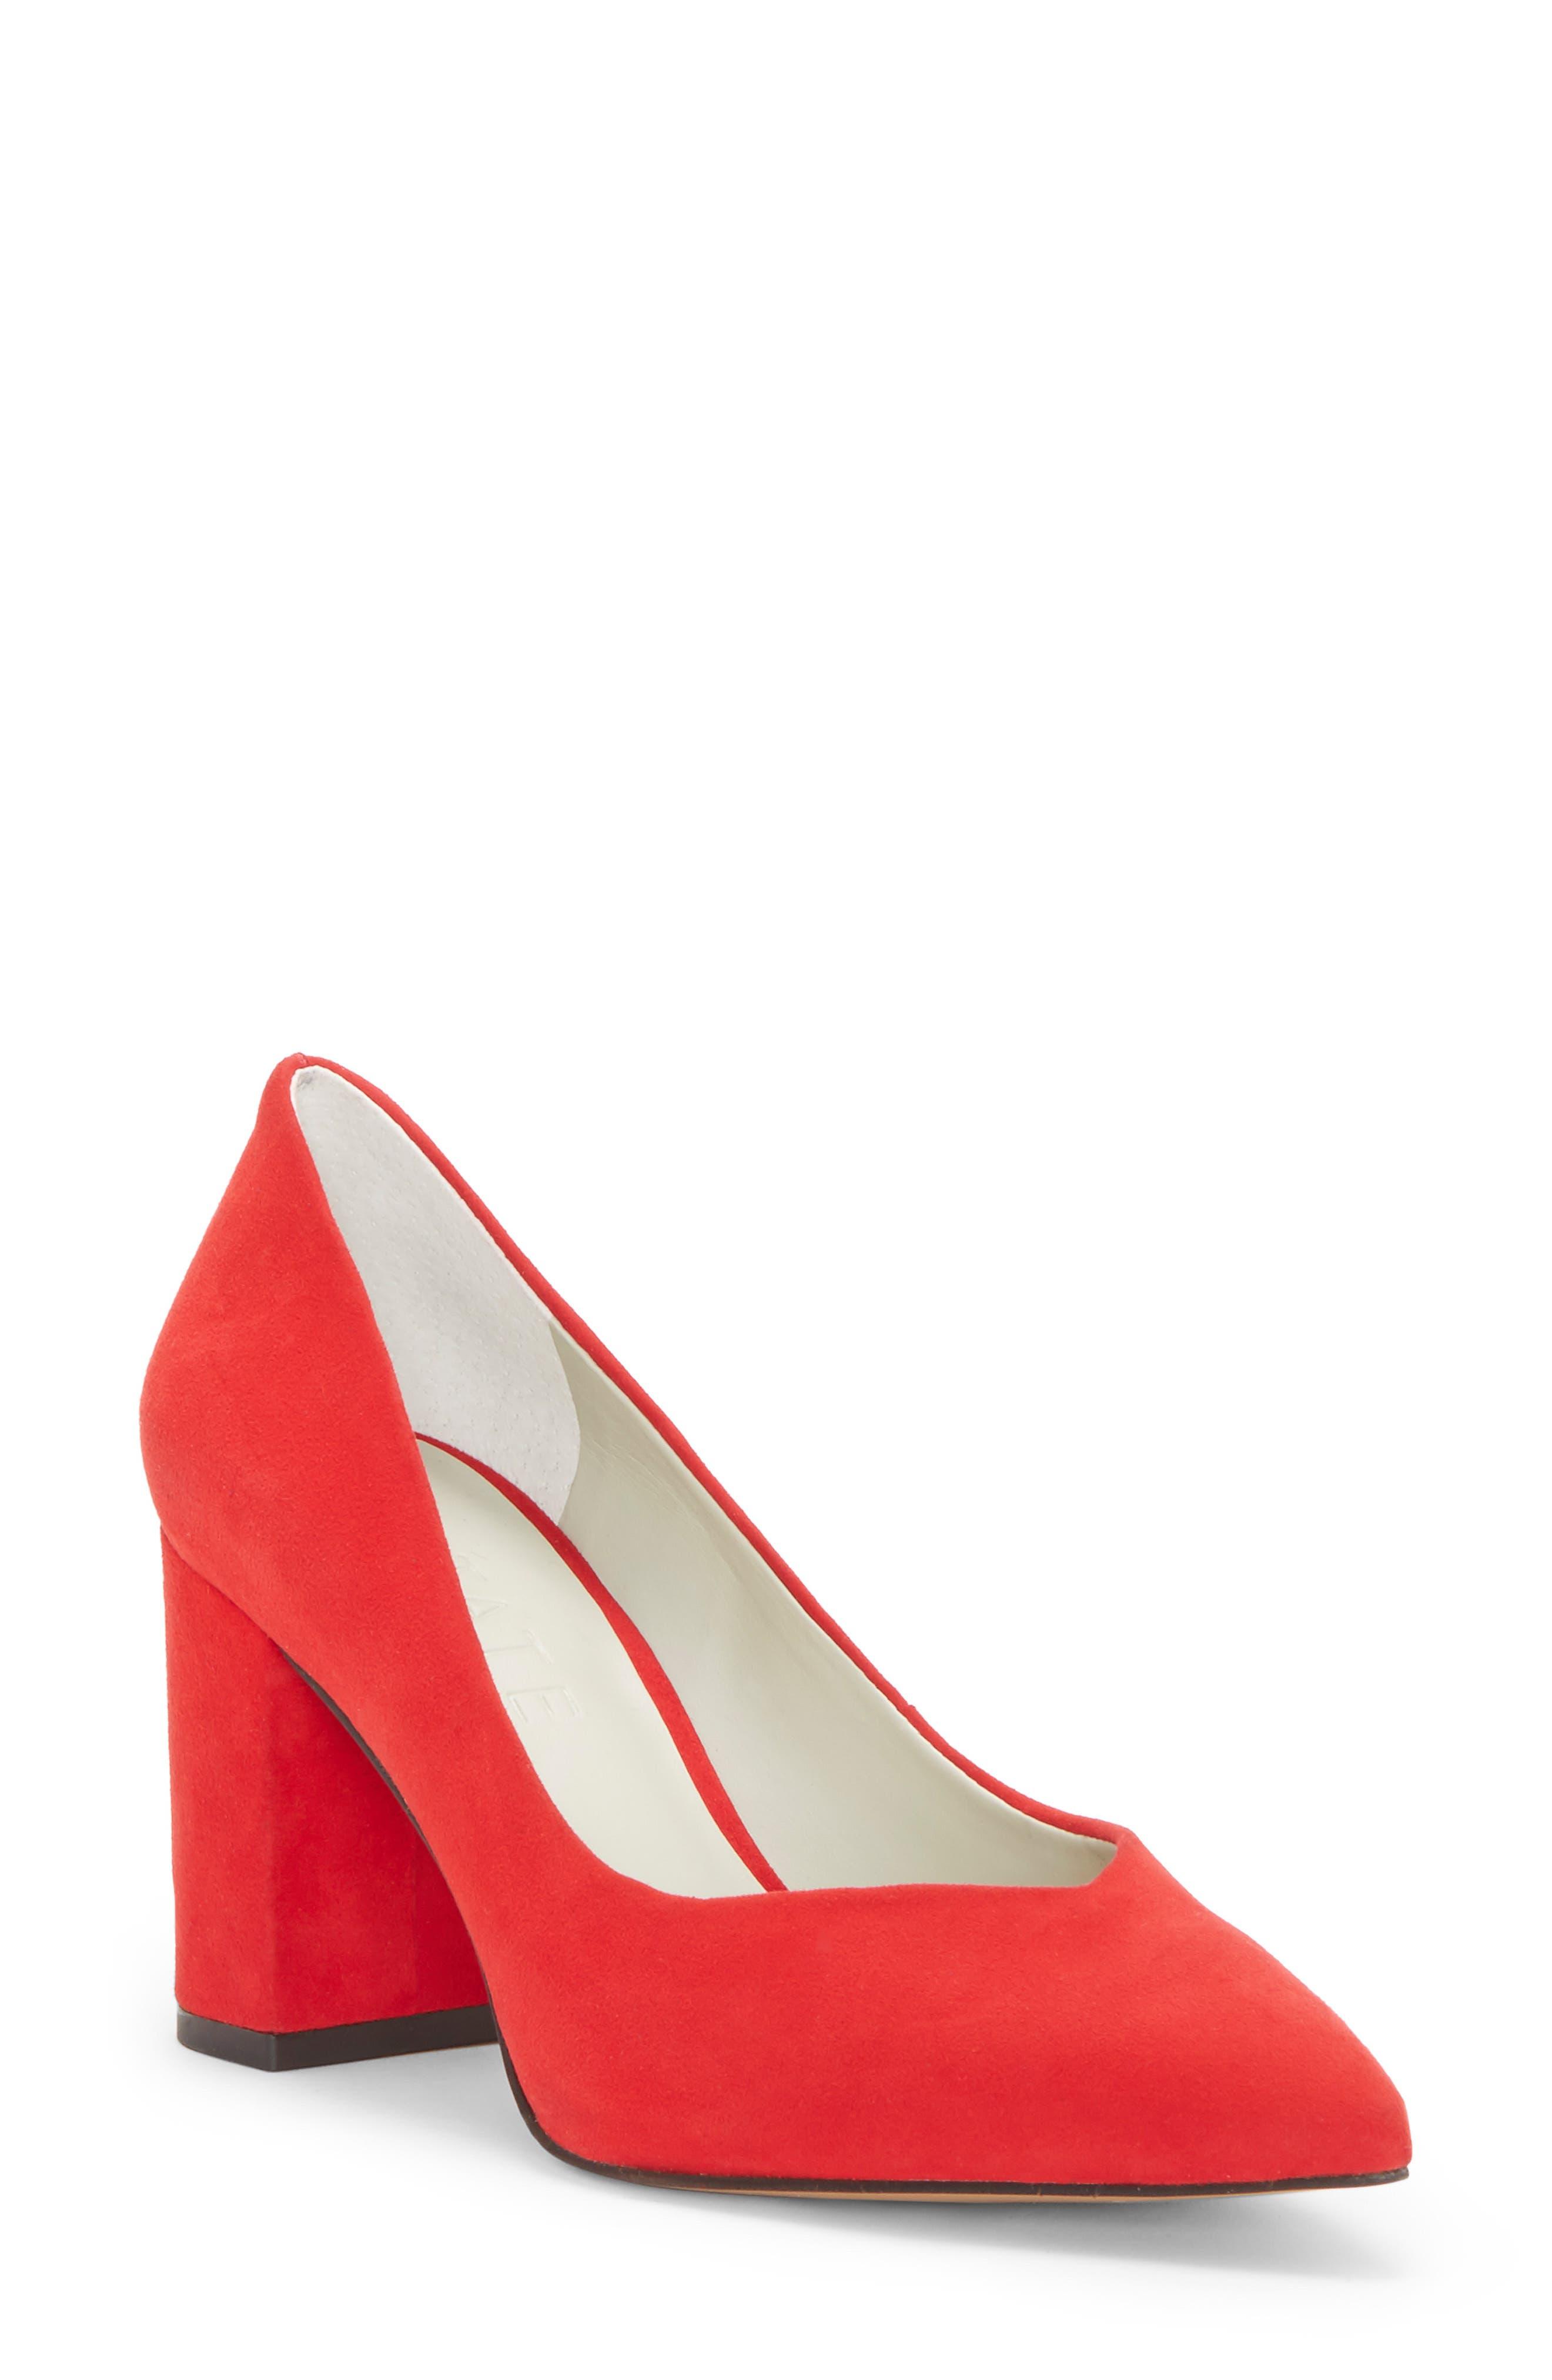 9bf7305fac285 womens bianca di rosso classic heels leather nvd2n3t  state saffy block  heel pump (women)